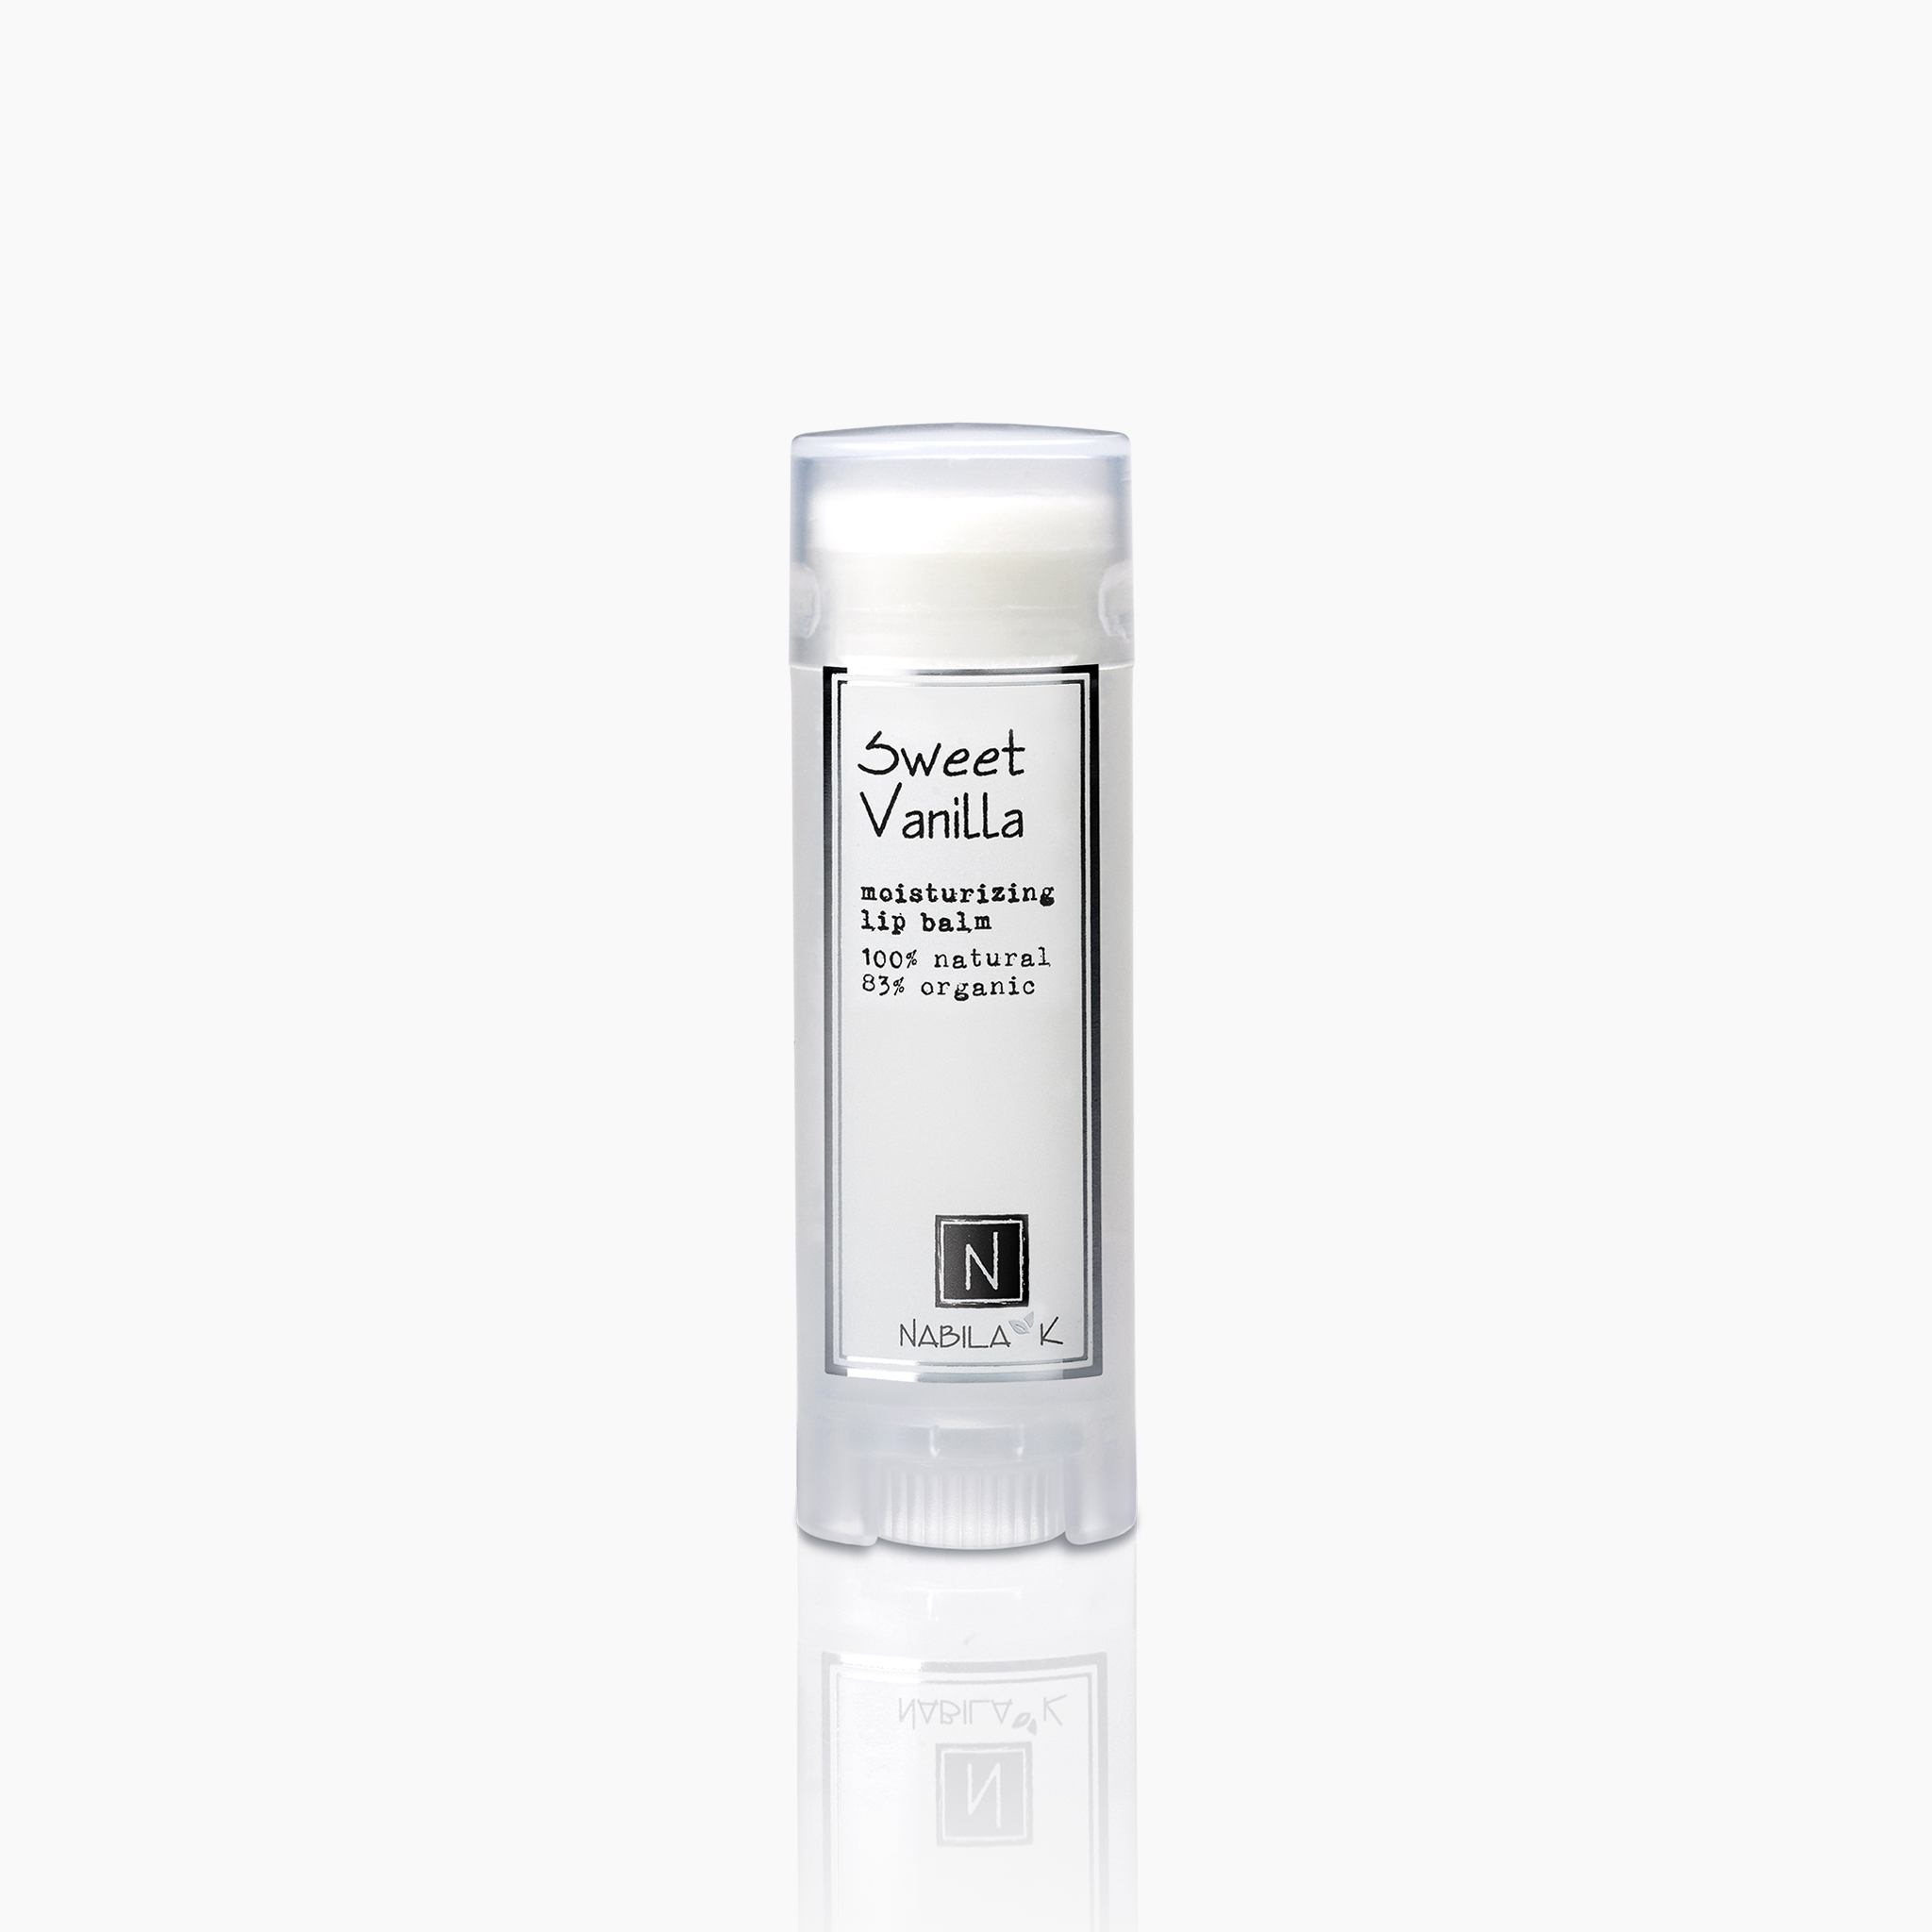 sweet vanilla moisturizing lip balm 100% natural 85% organic